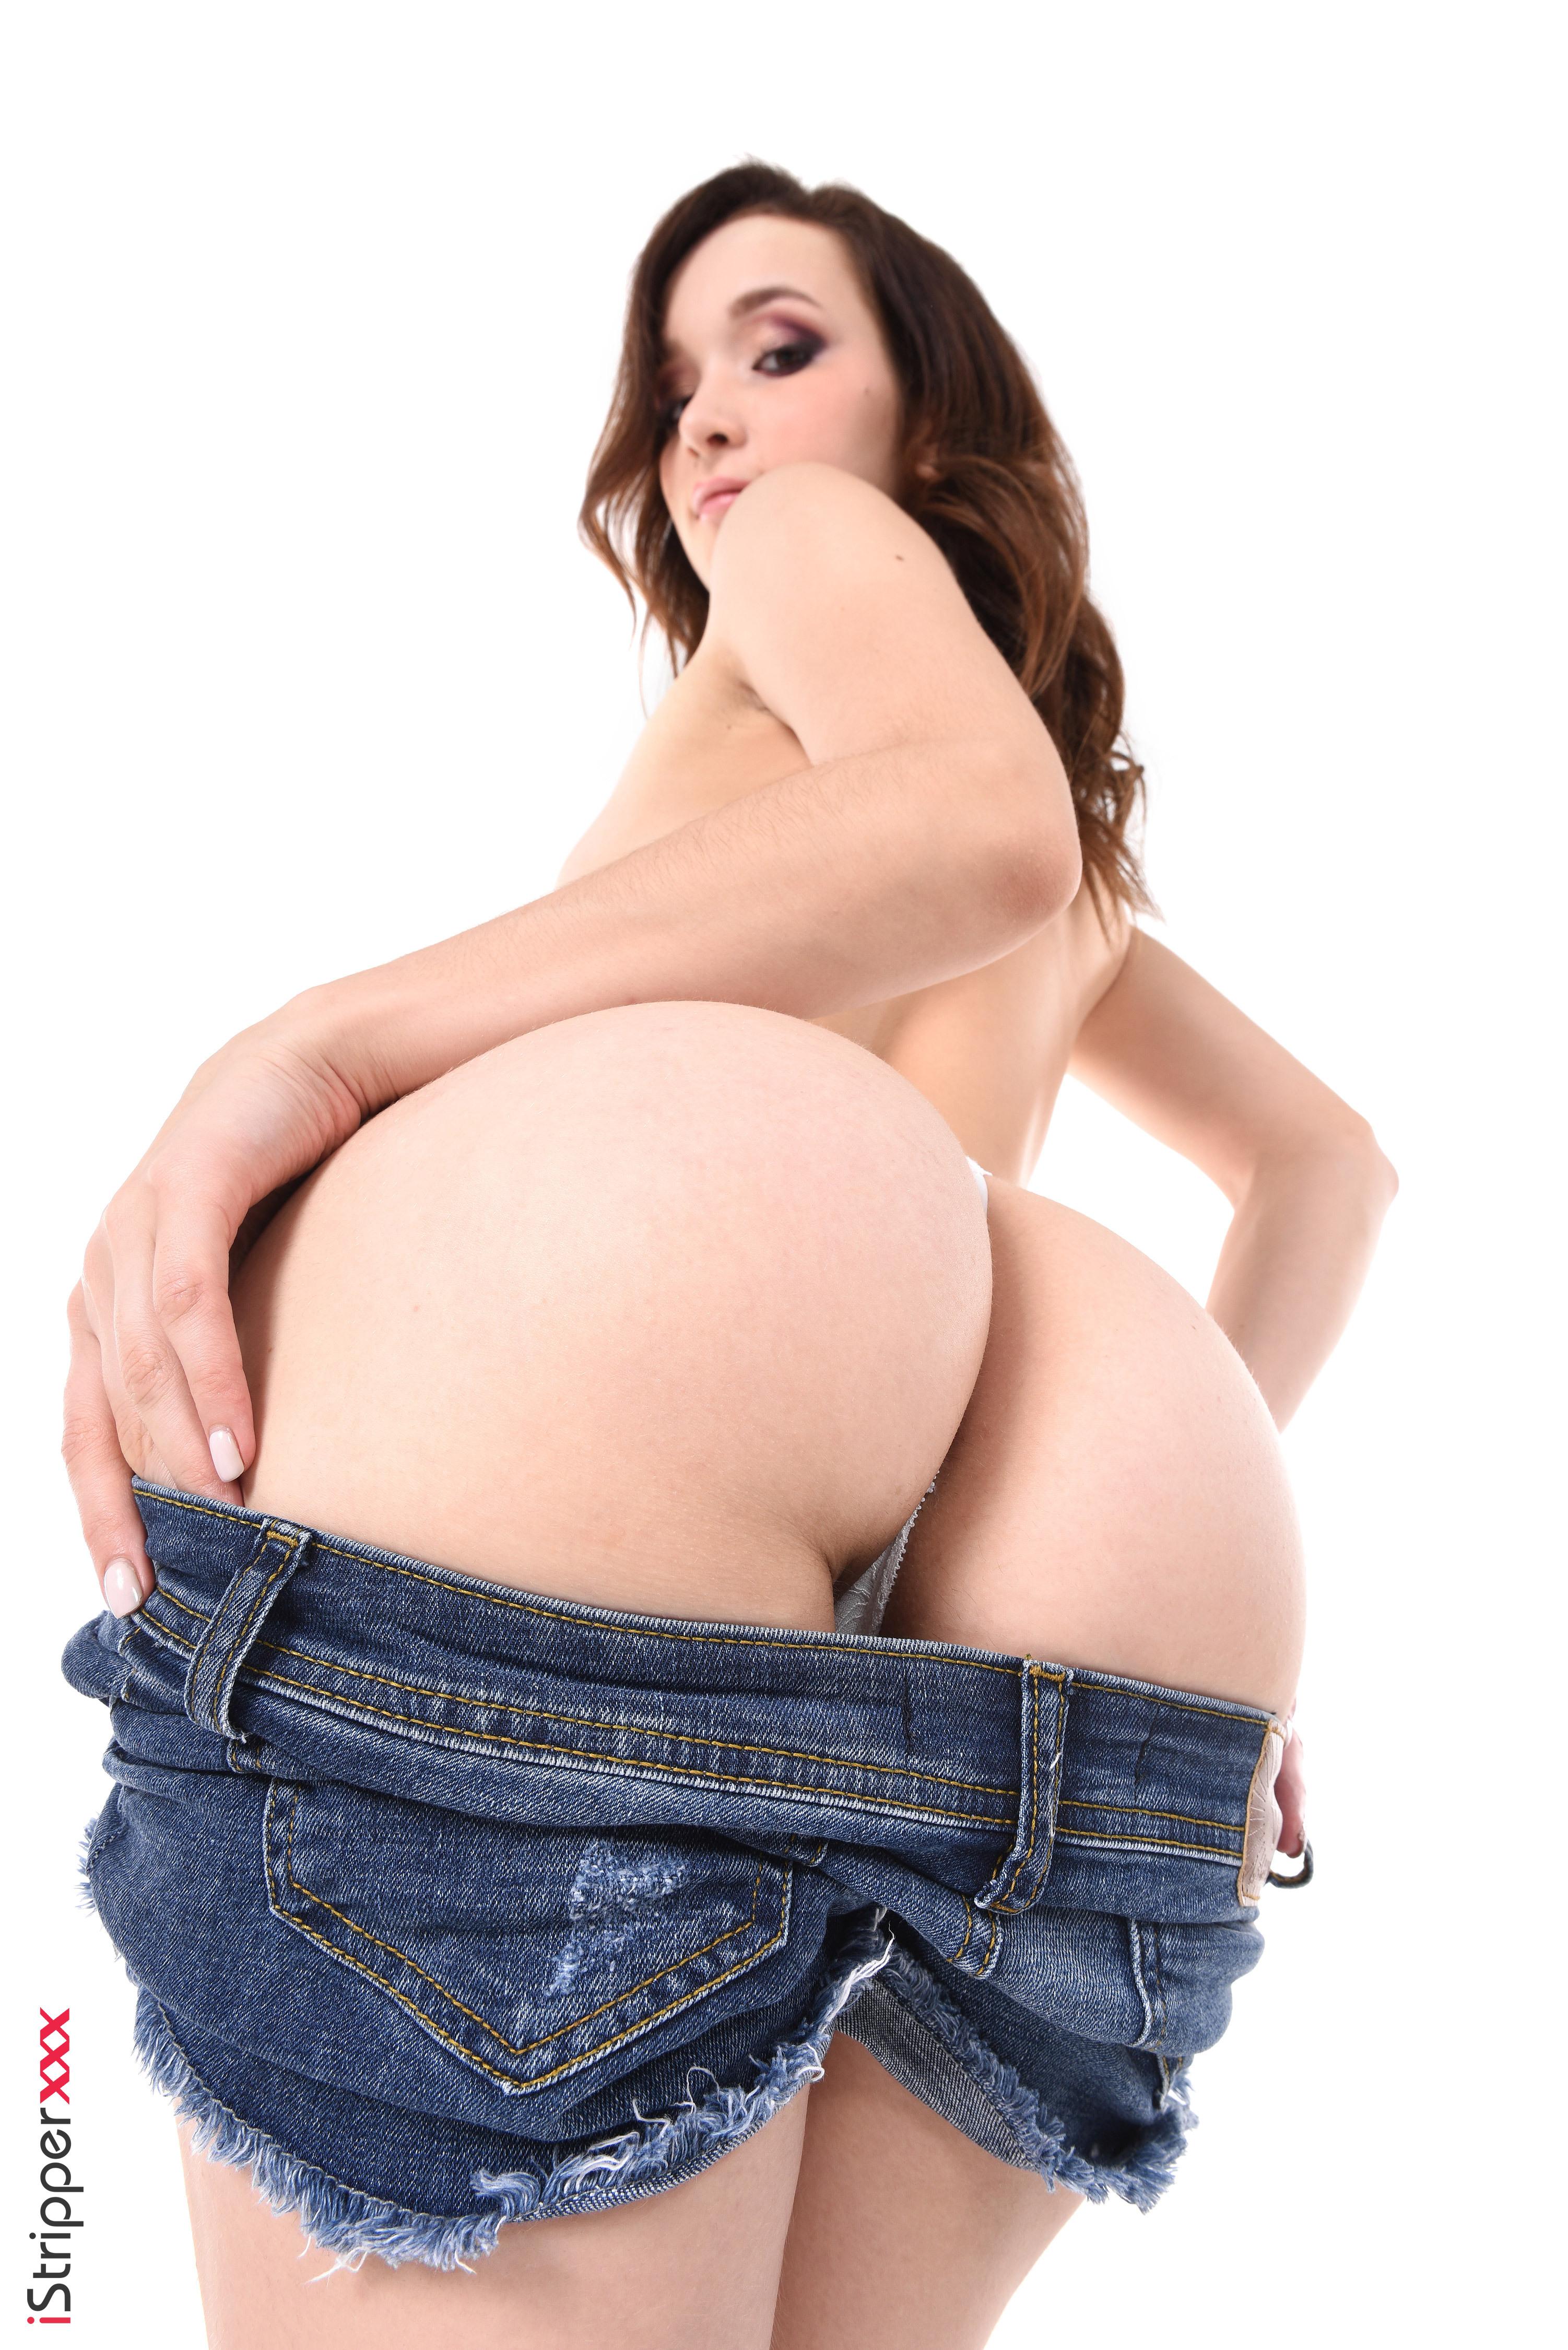 wallpaper Nude Tittied beauties Latina ladies boobed chicks